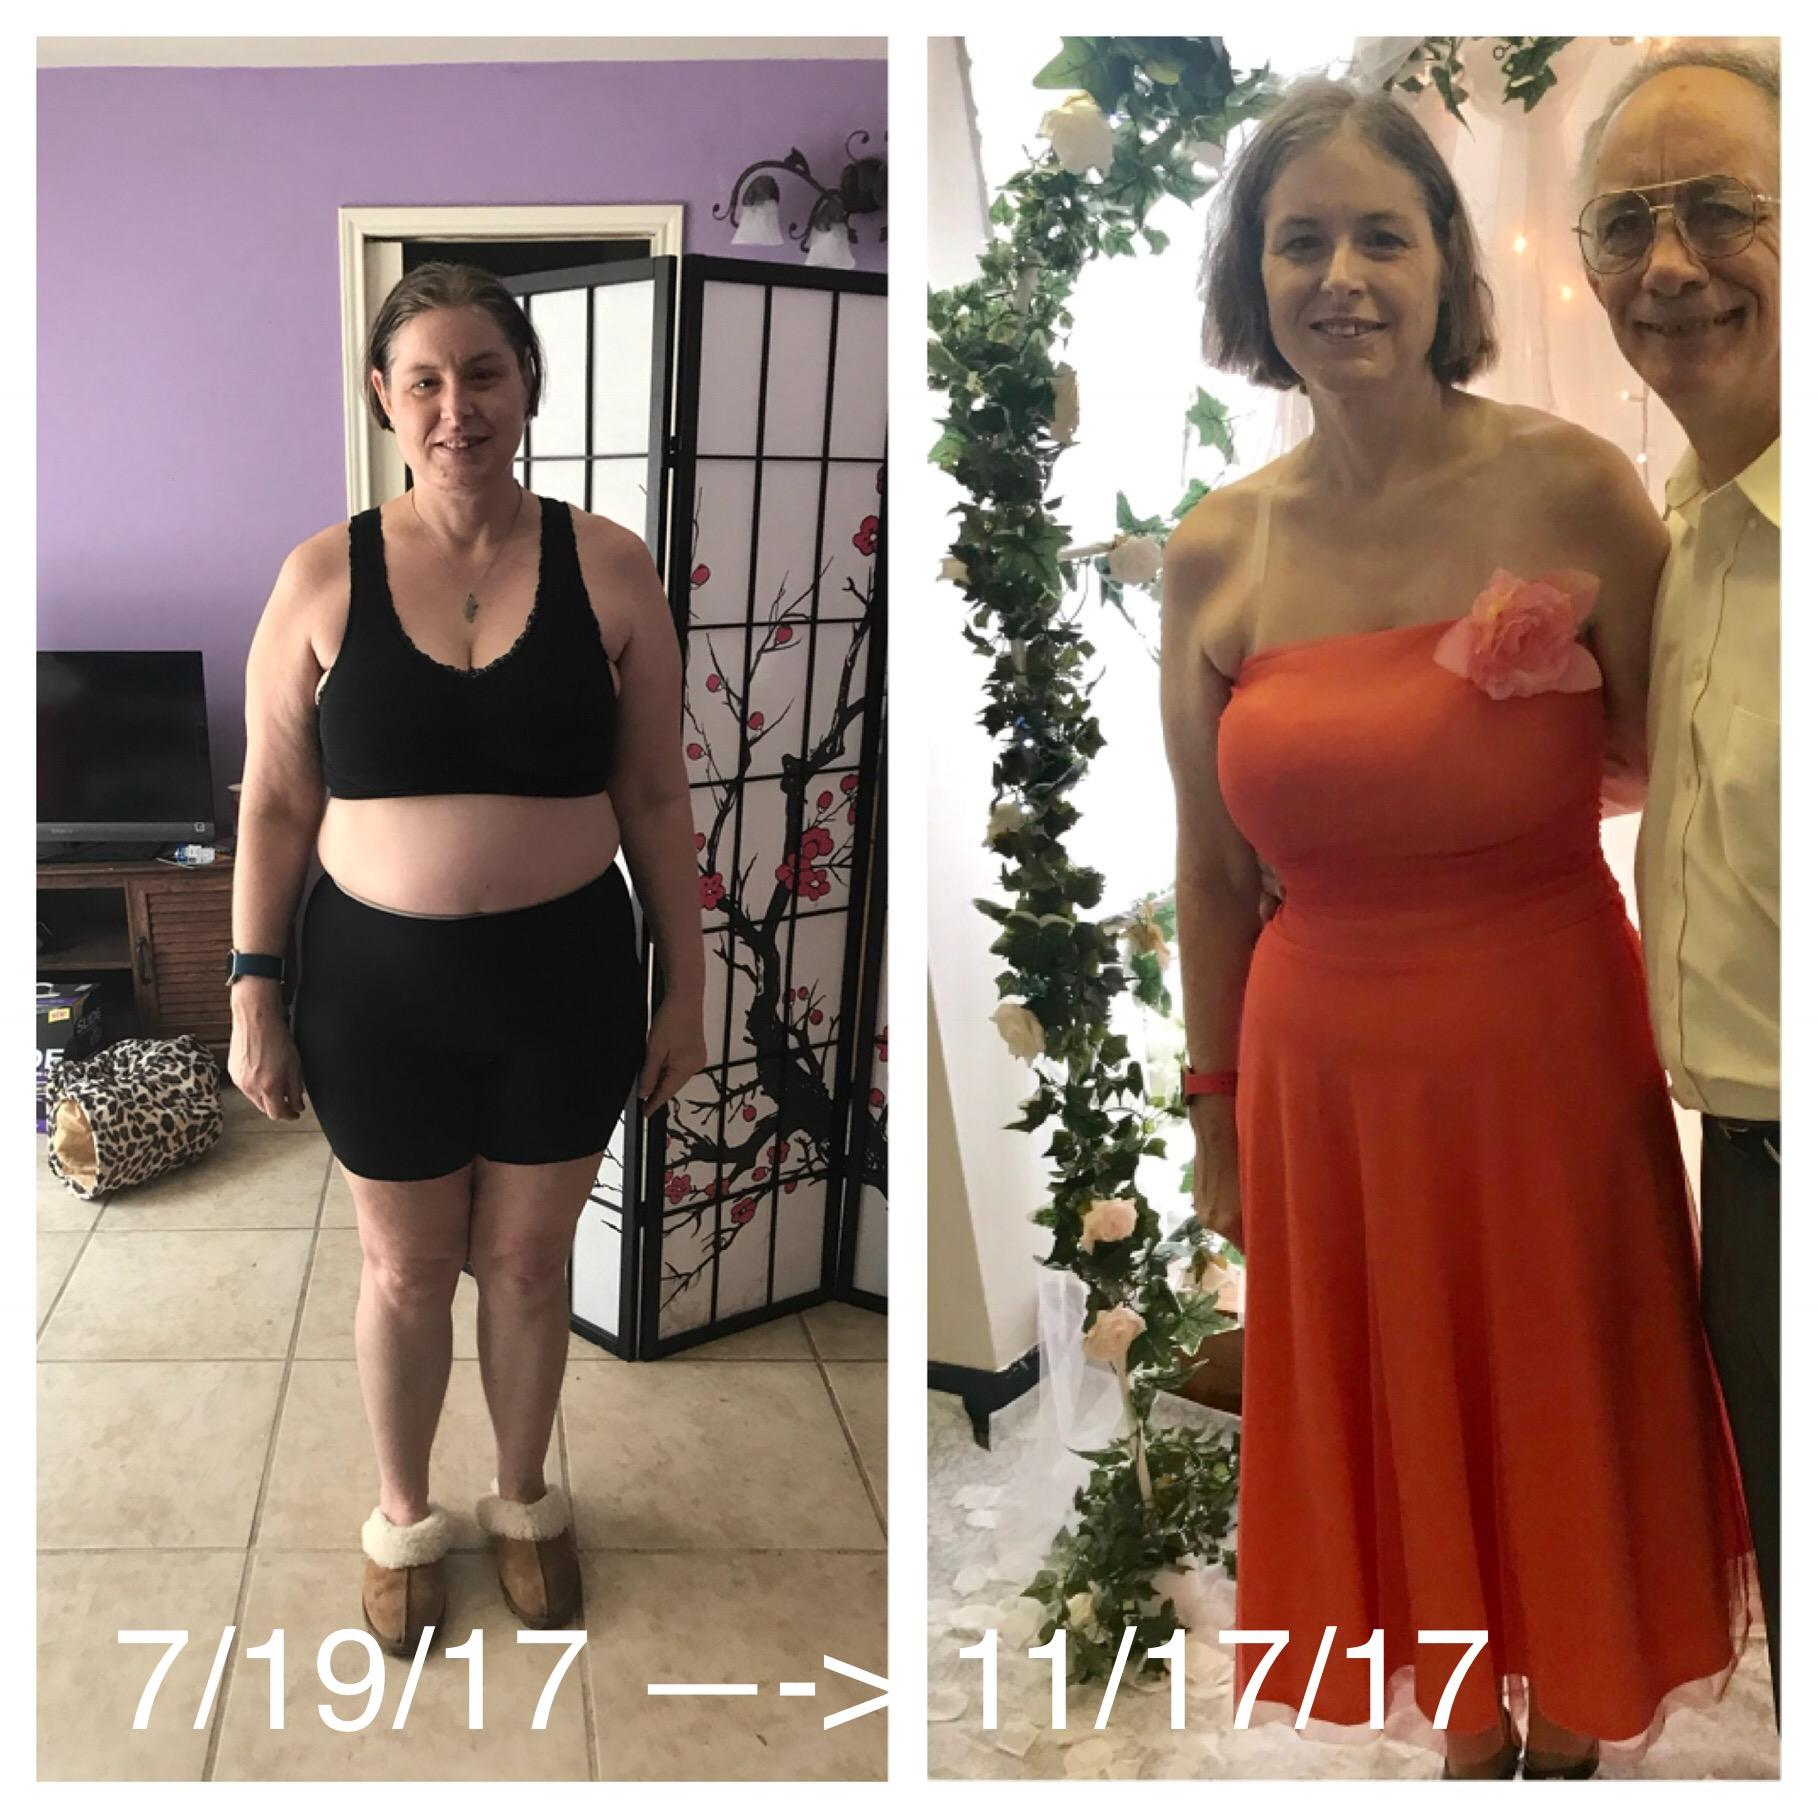 Best home workout fat loss